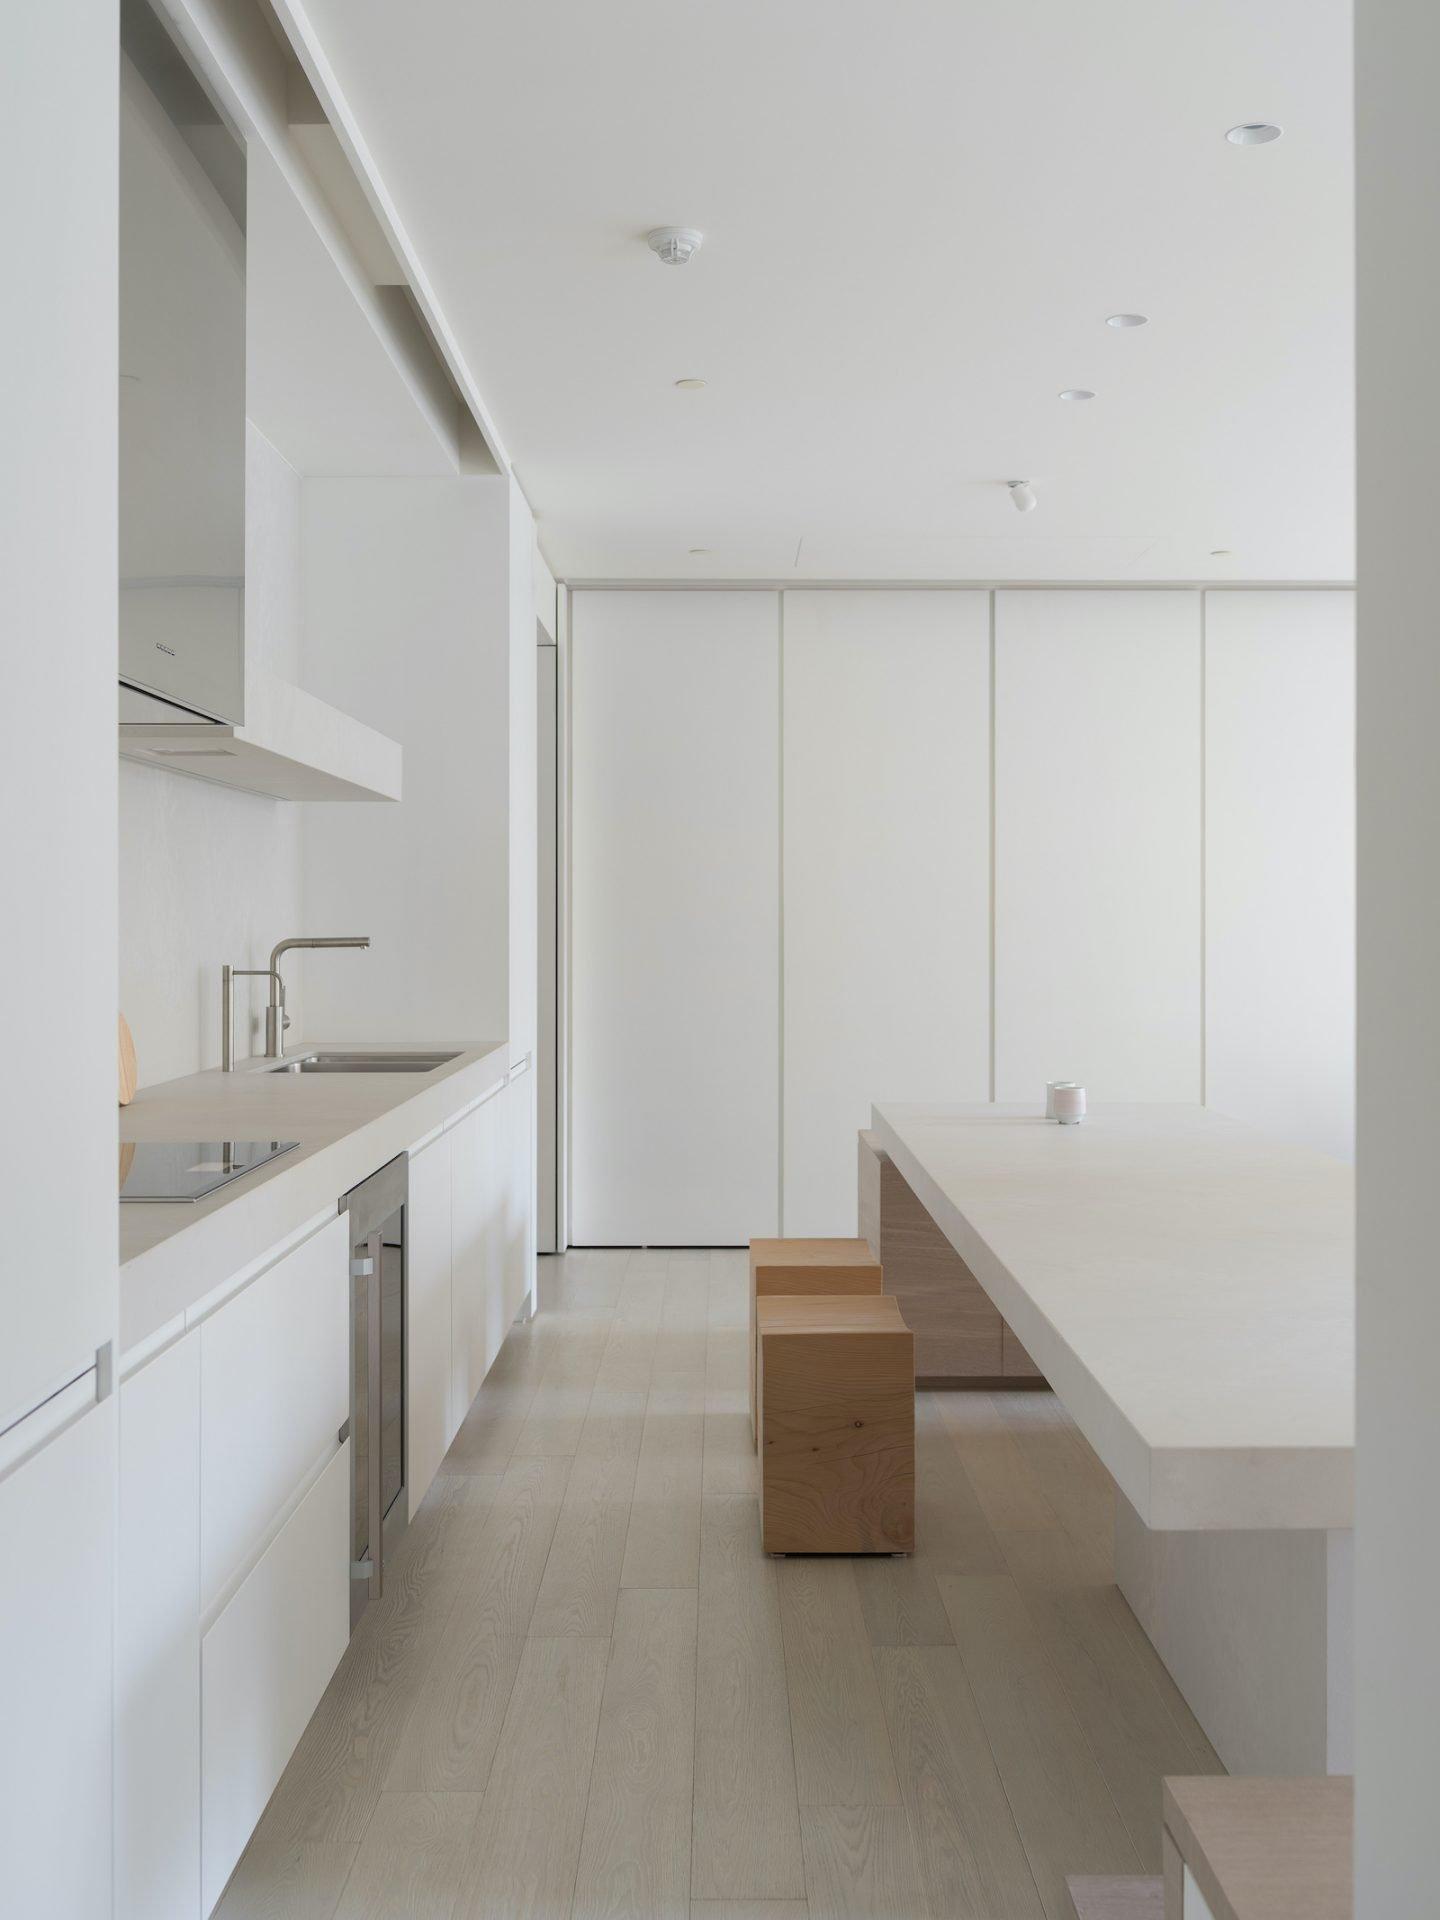 IGNANT-Architecture-Marty-Chou-KOA-Apartment-09